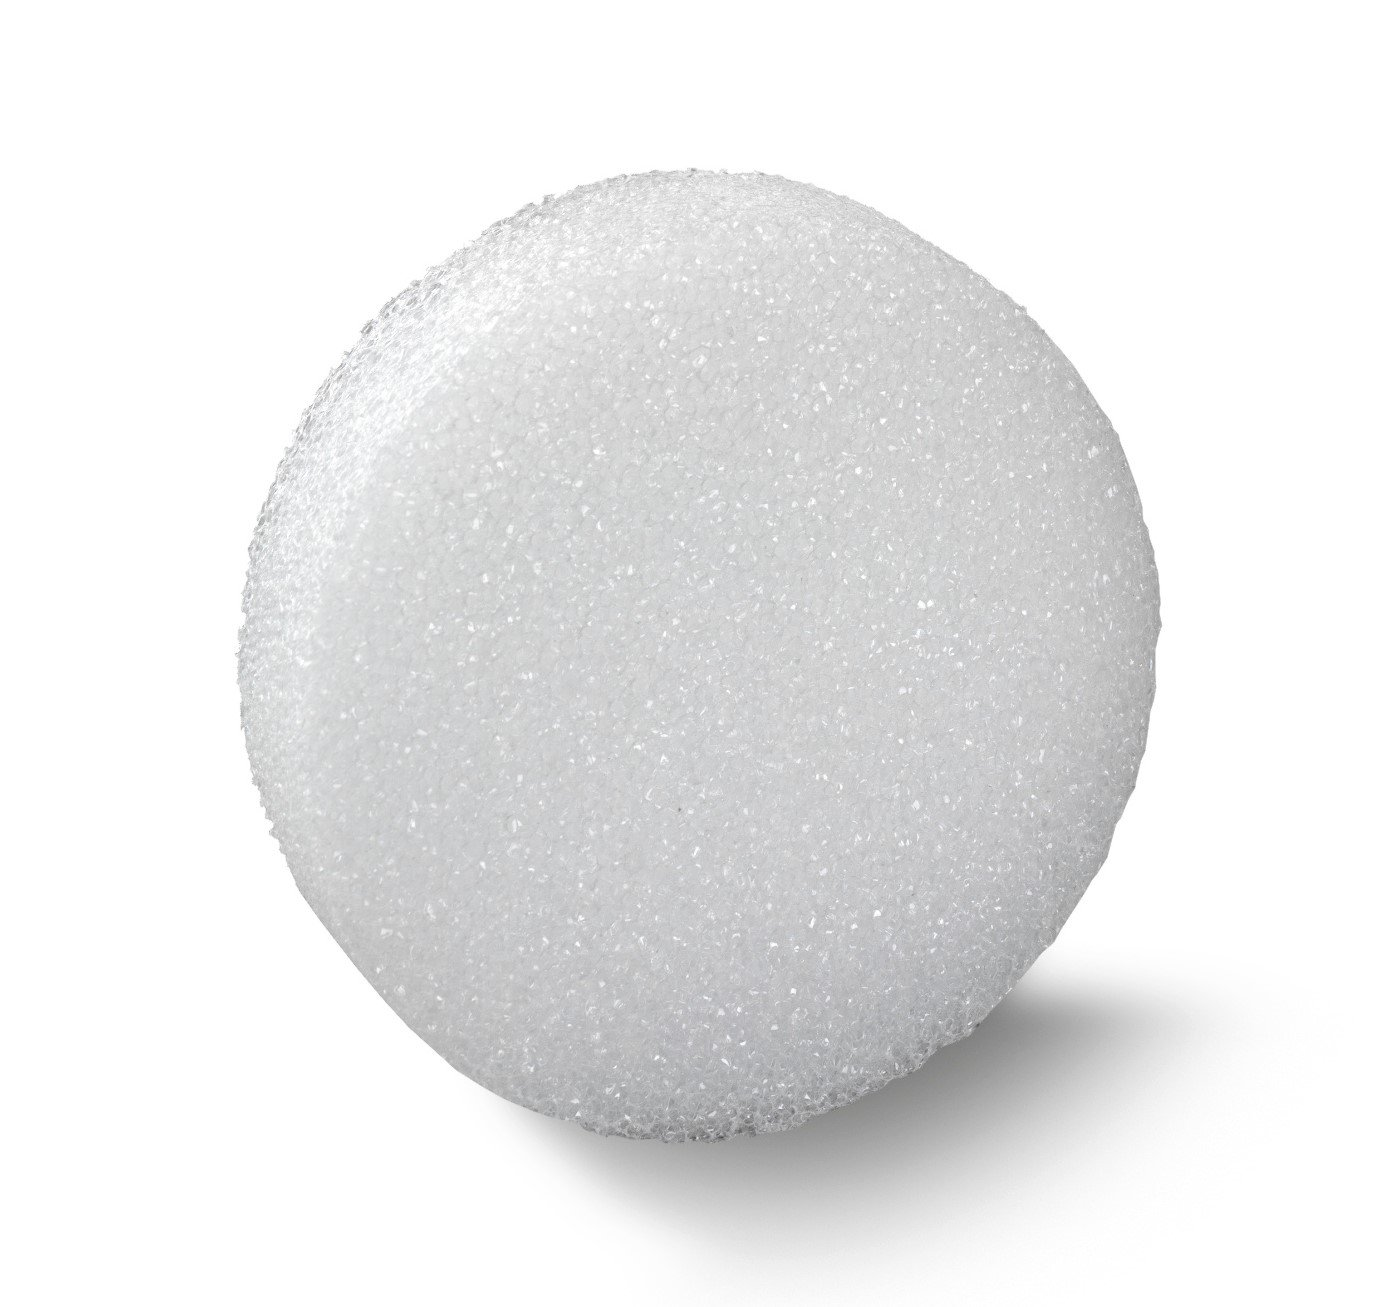 FloraCraft D7125WS/36 Styrofoam Discs, 7-Inch-by-1/2-Inch-by-1 1/4-Inch Disc, White